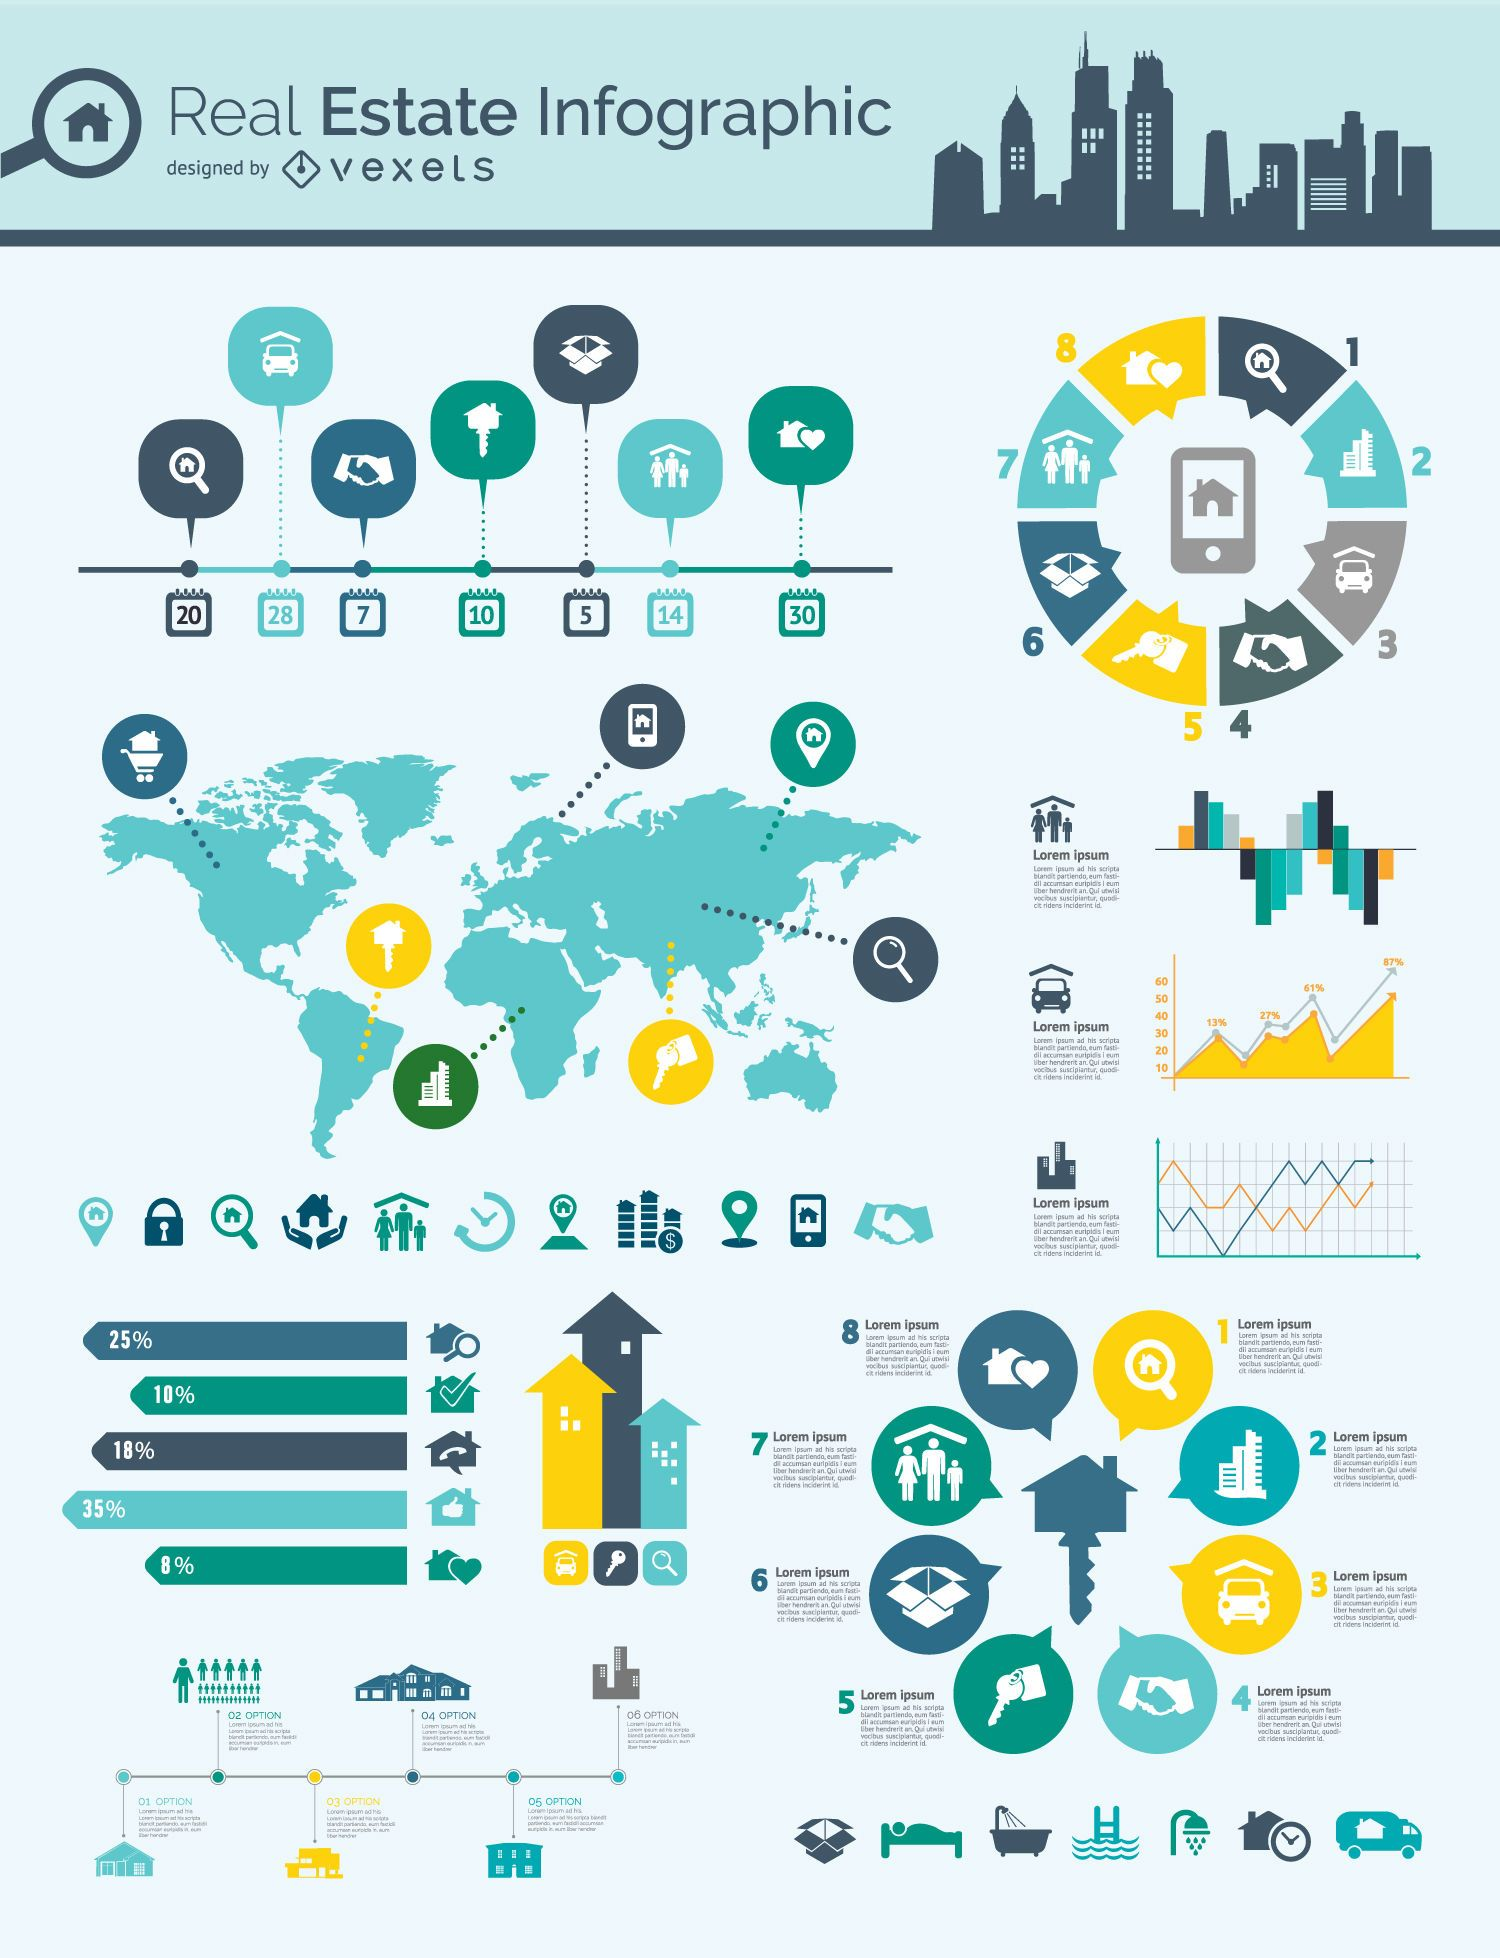 Real estate infographic mindmap